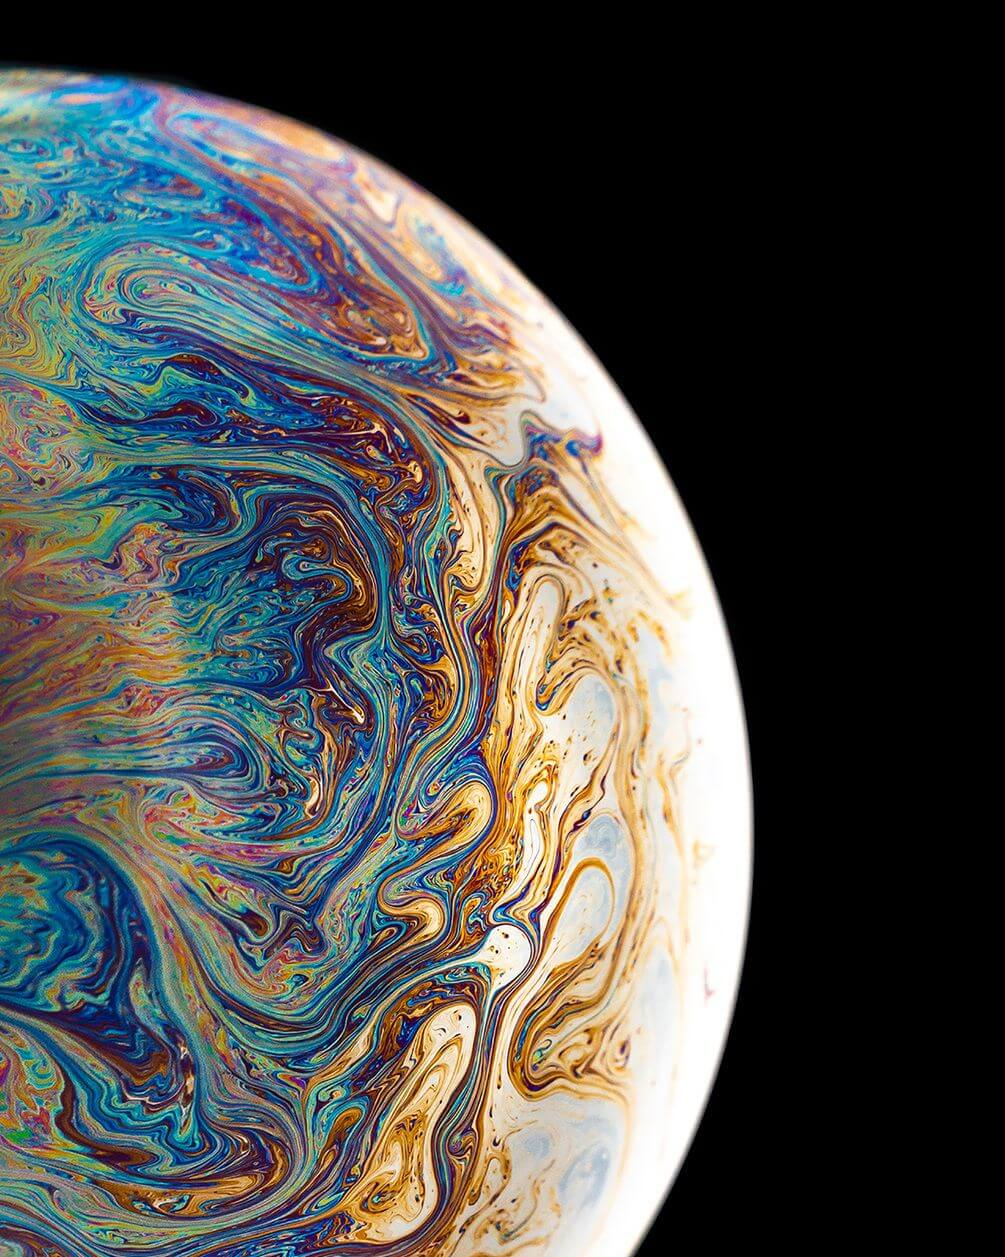 Картинка планеты на айфон